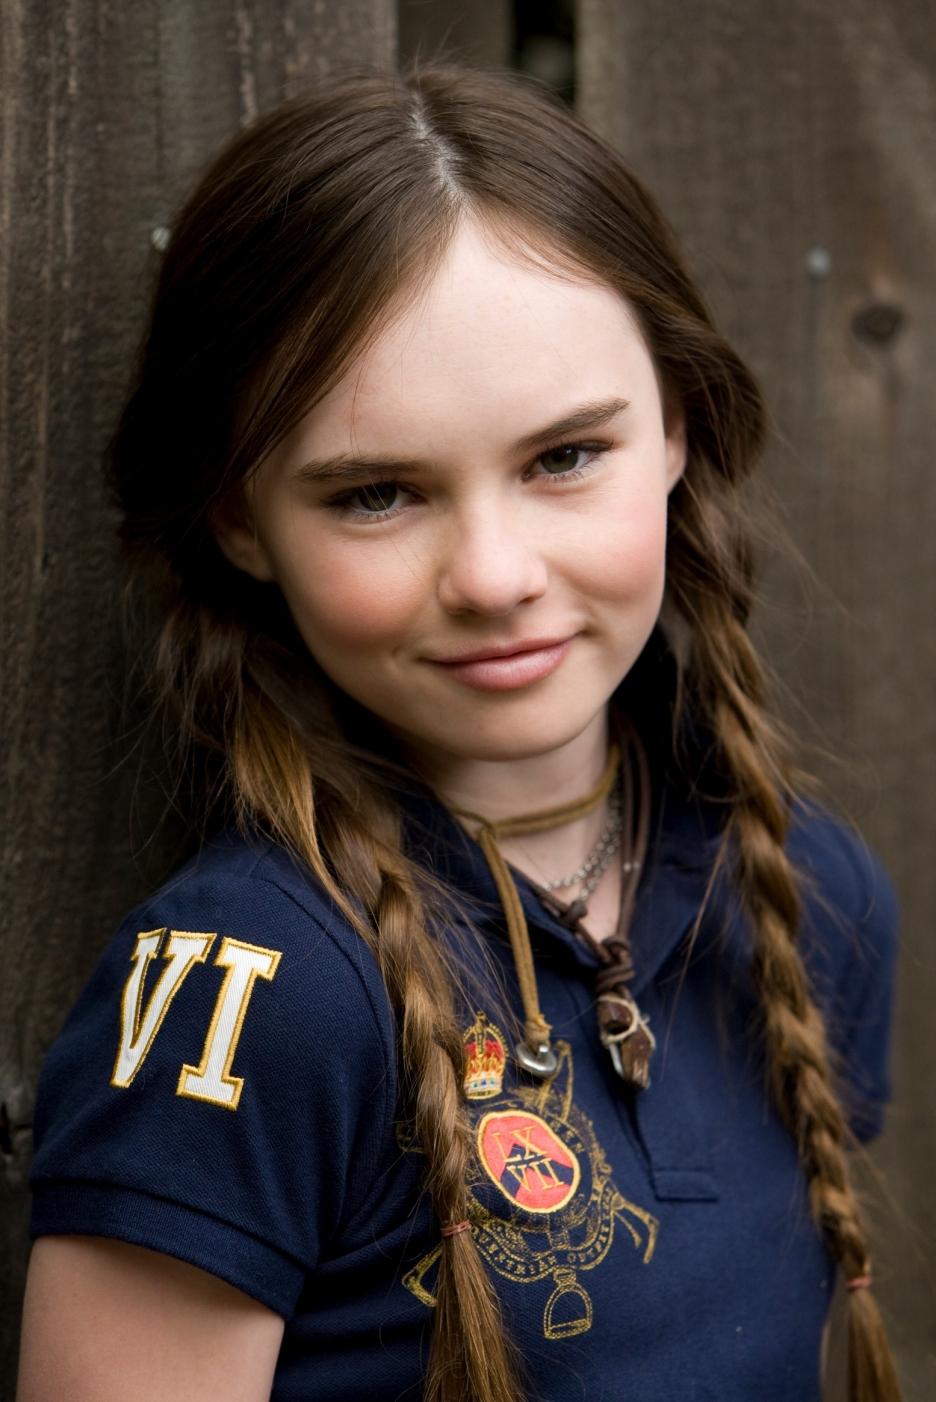 Smart College Girl Wallpaper Celebrity Pics Madeline Carroll